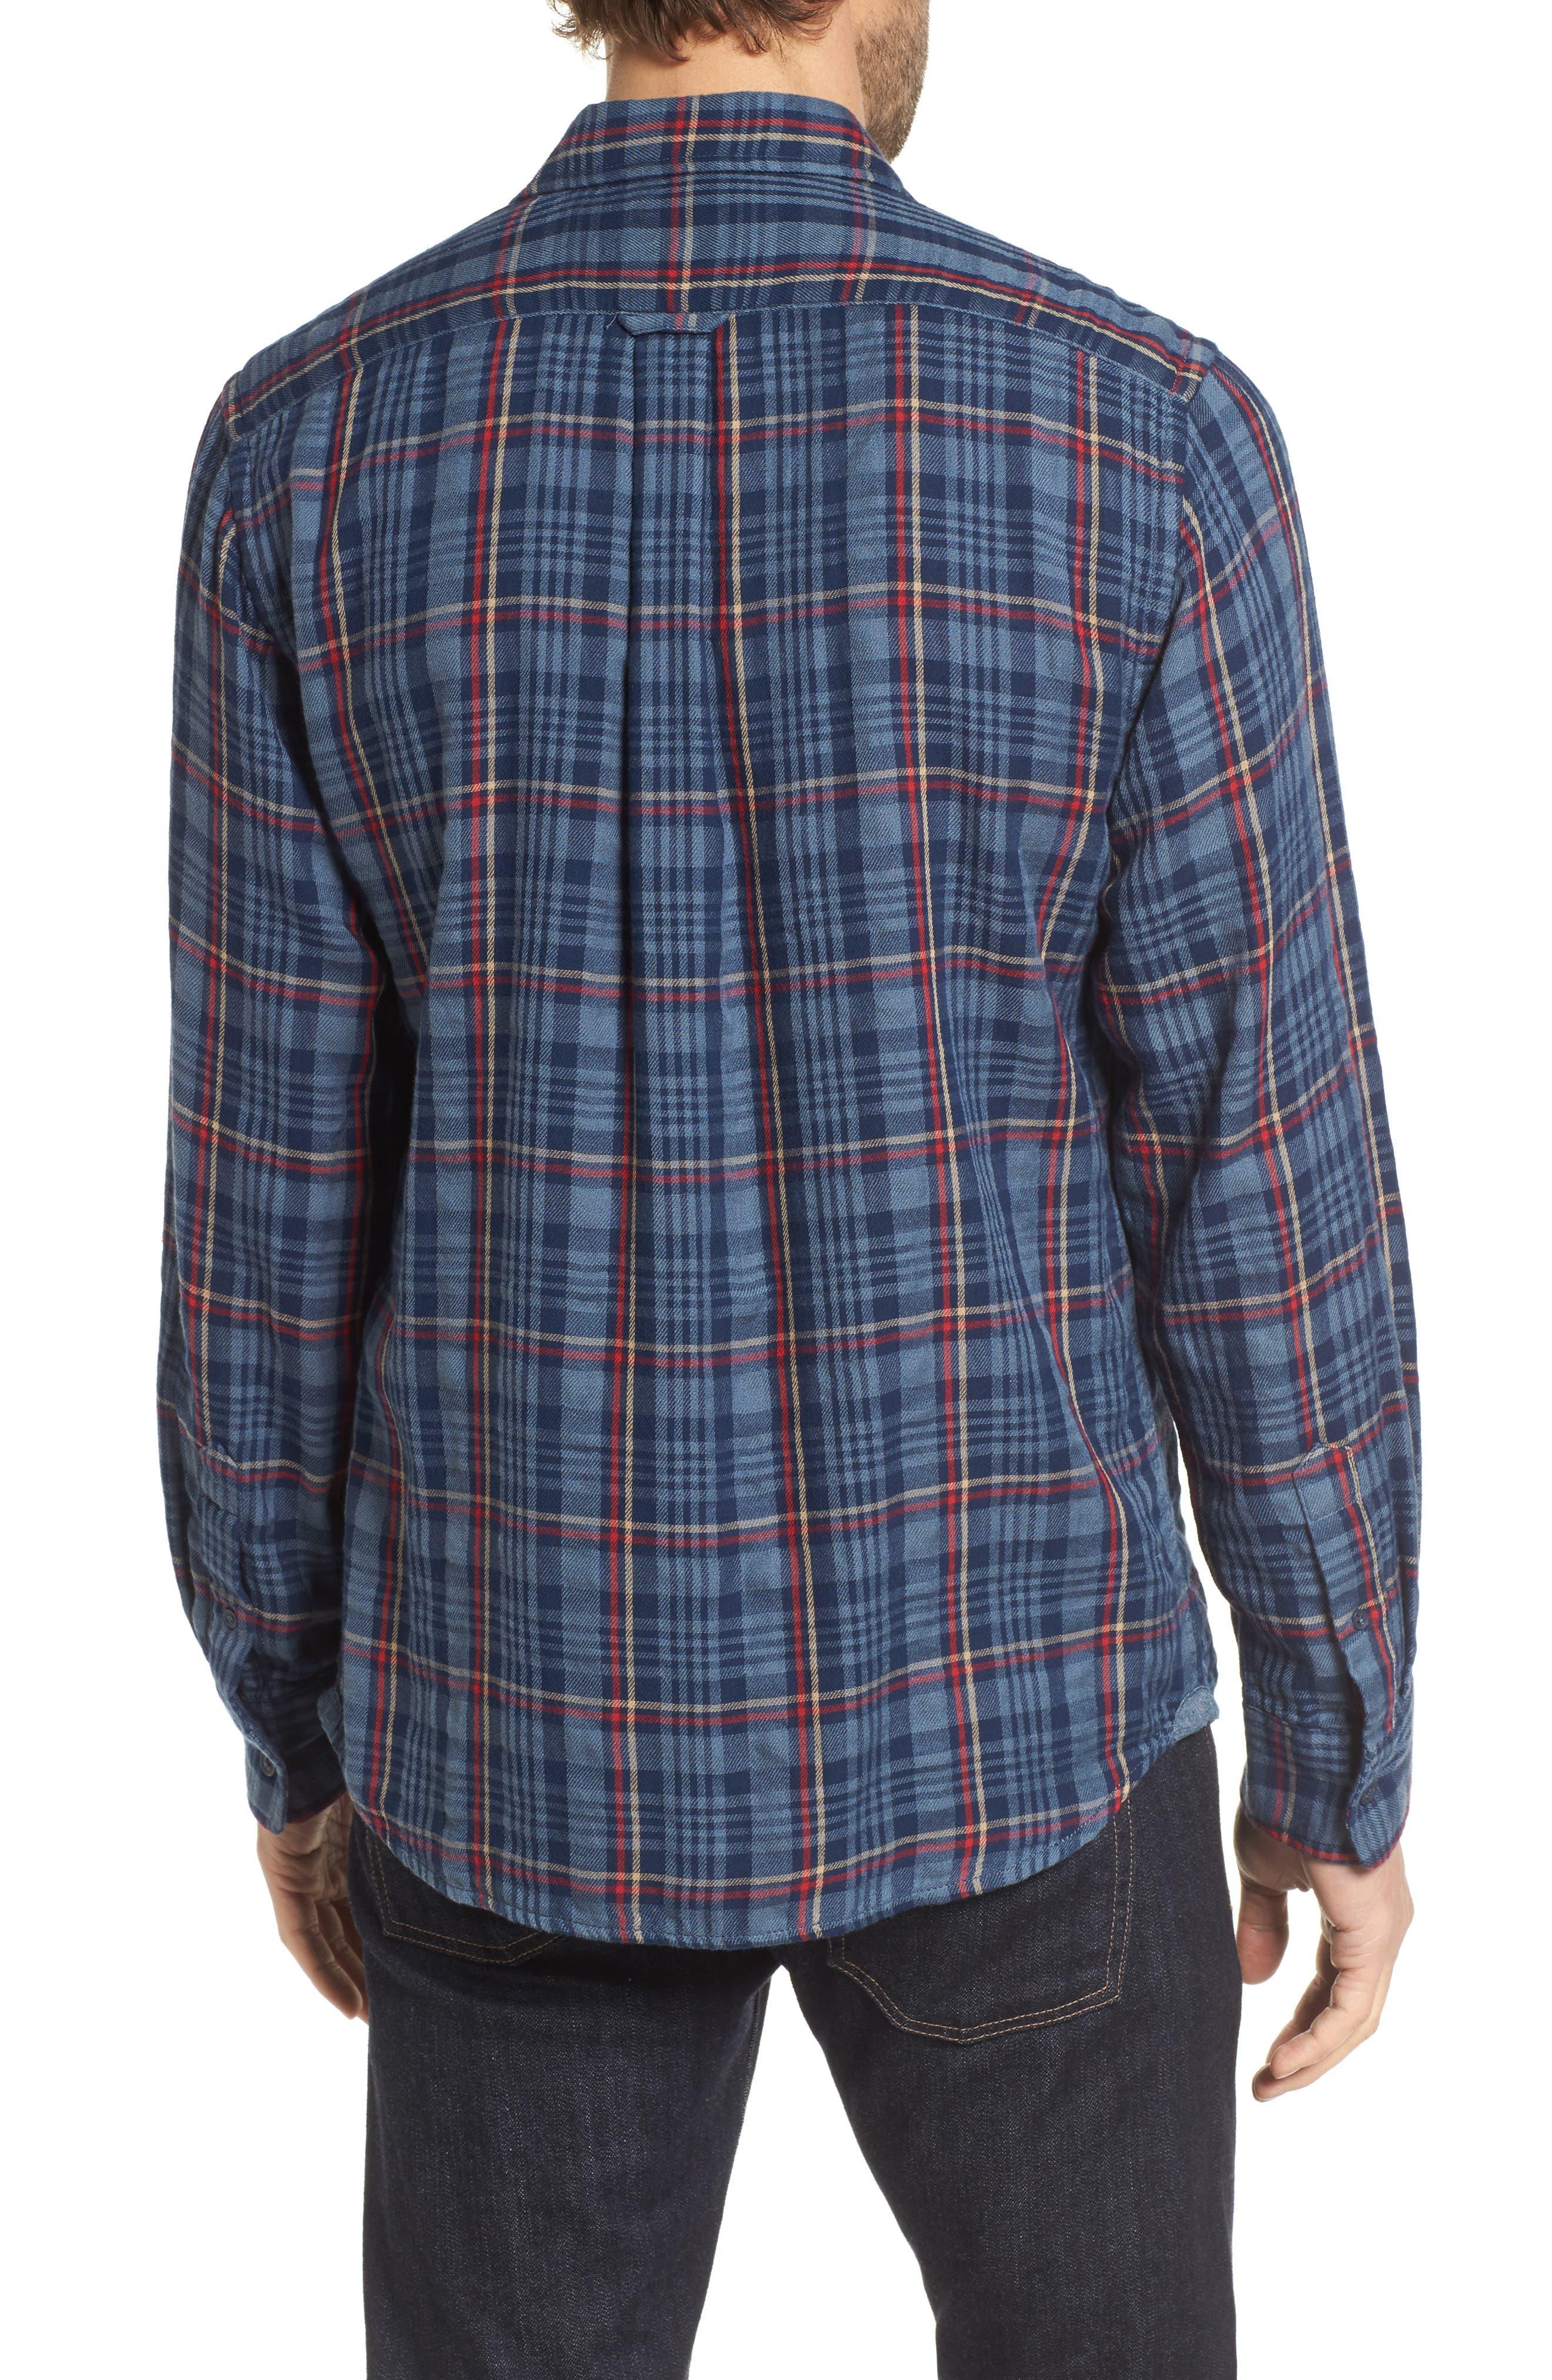 Alton Double Cloth Plaid Sport Shirt,                             Alternate thumbnail 2, color,                             Navy Grey Plaid